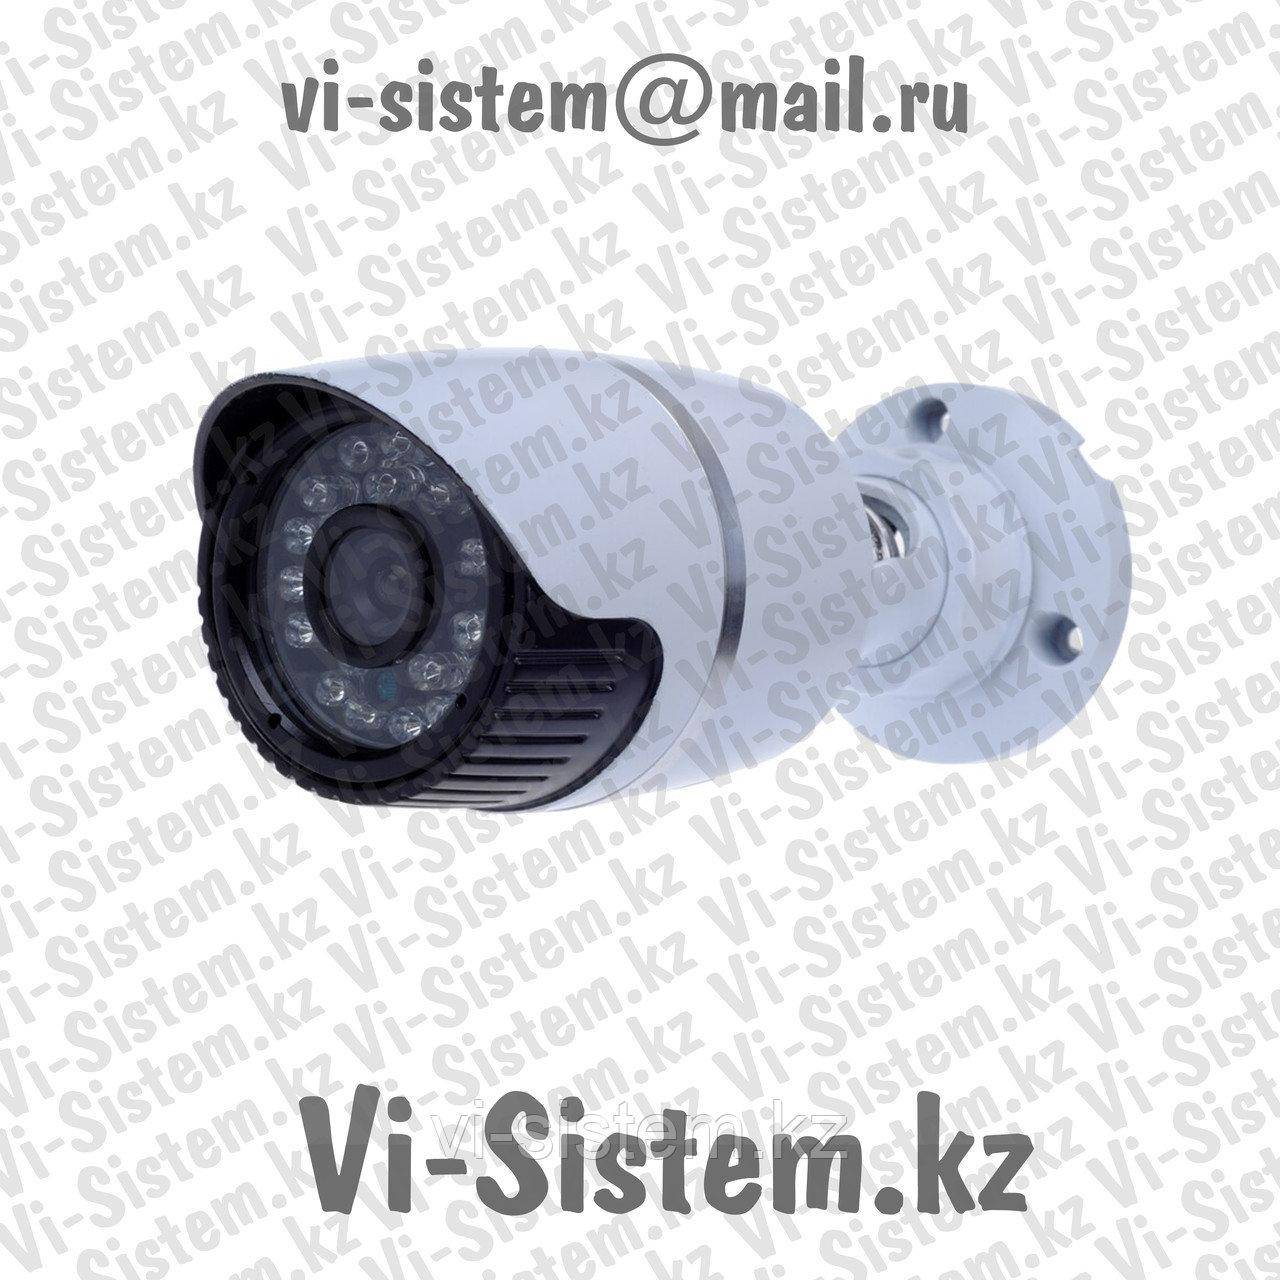 IP-Видеокамера SYNCAR SY-287 POE 2MP